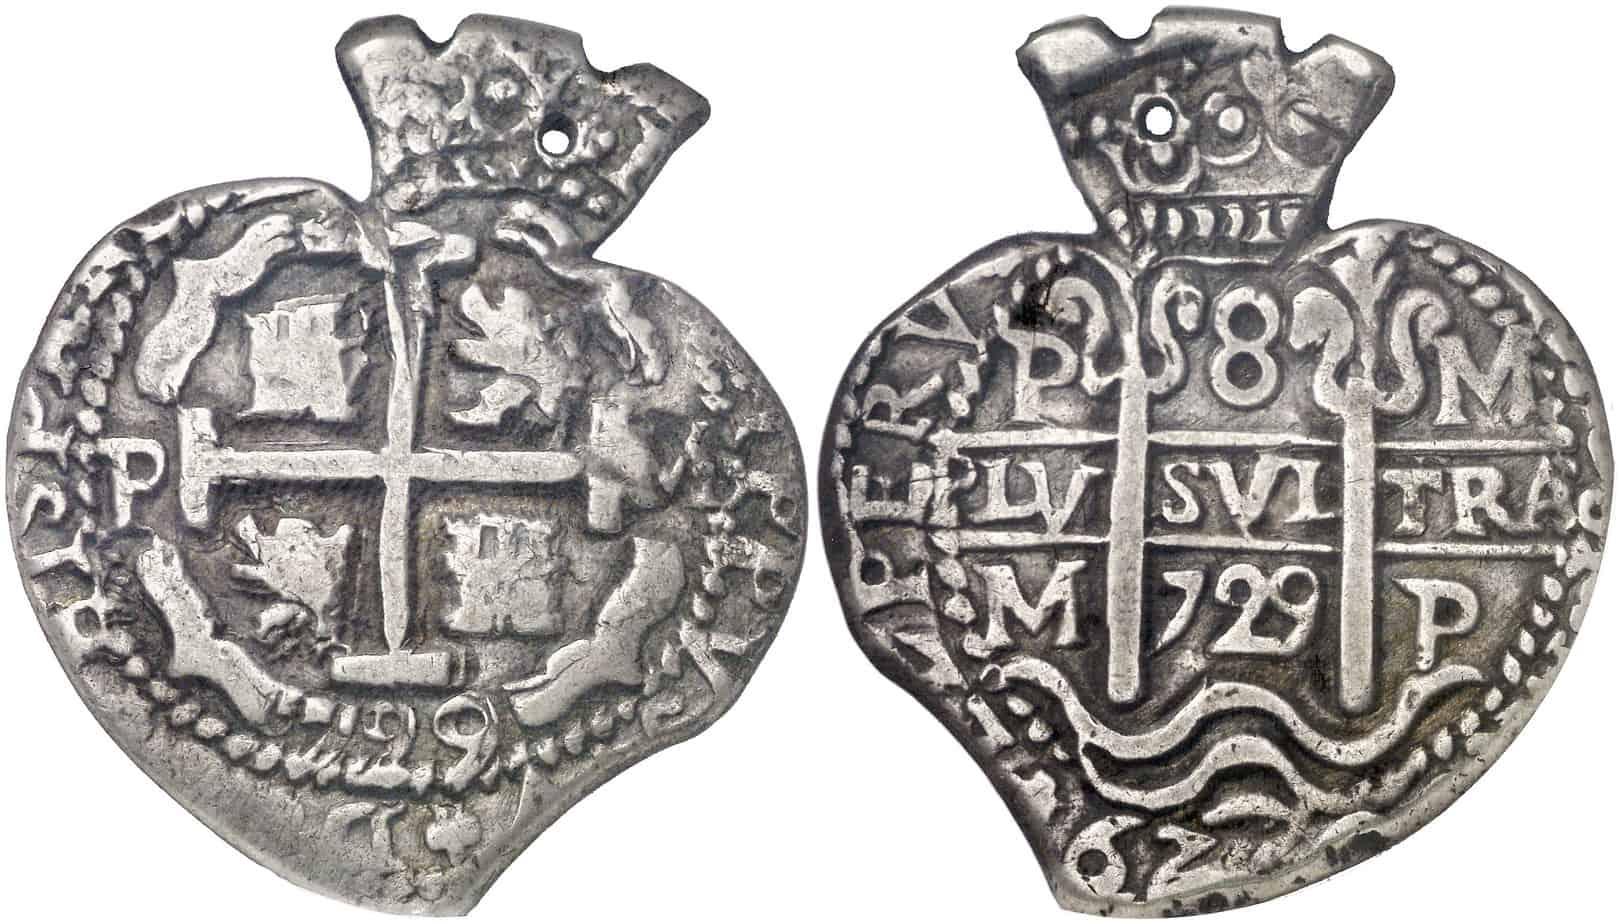 Figura 7: 1729. Potosí. M. 8 reales.